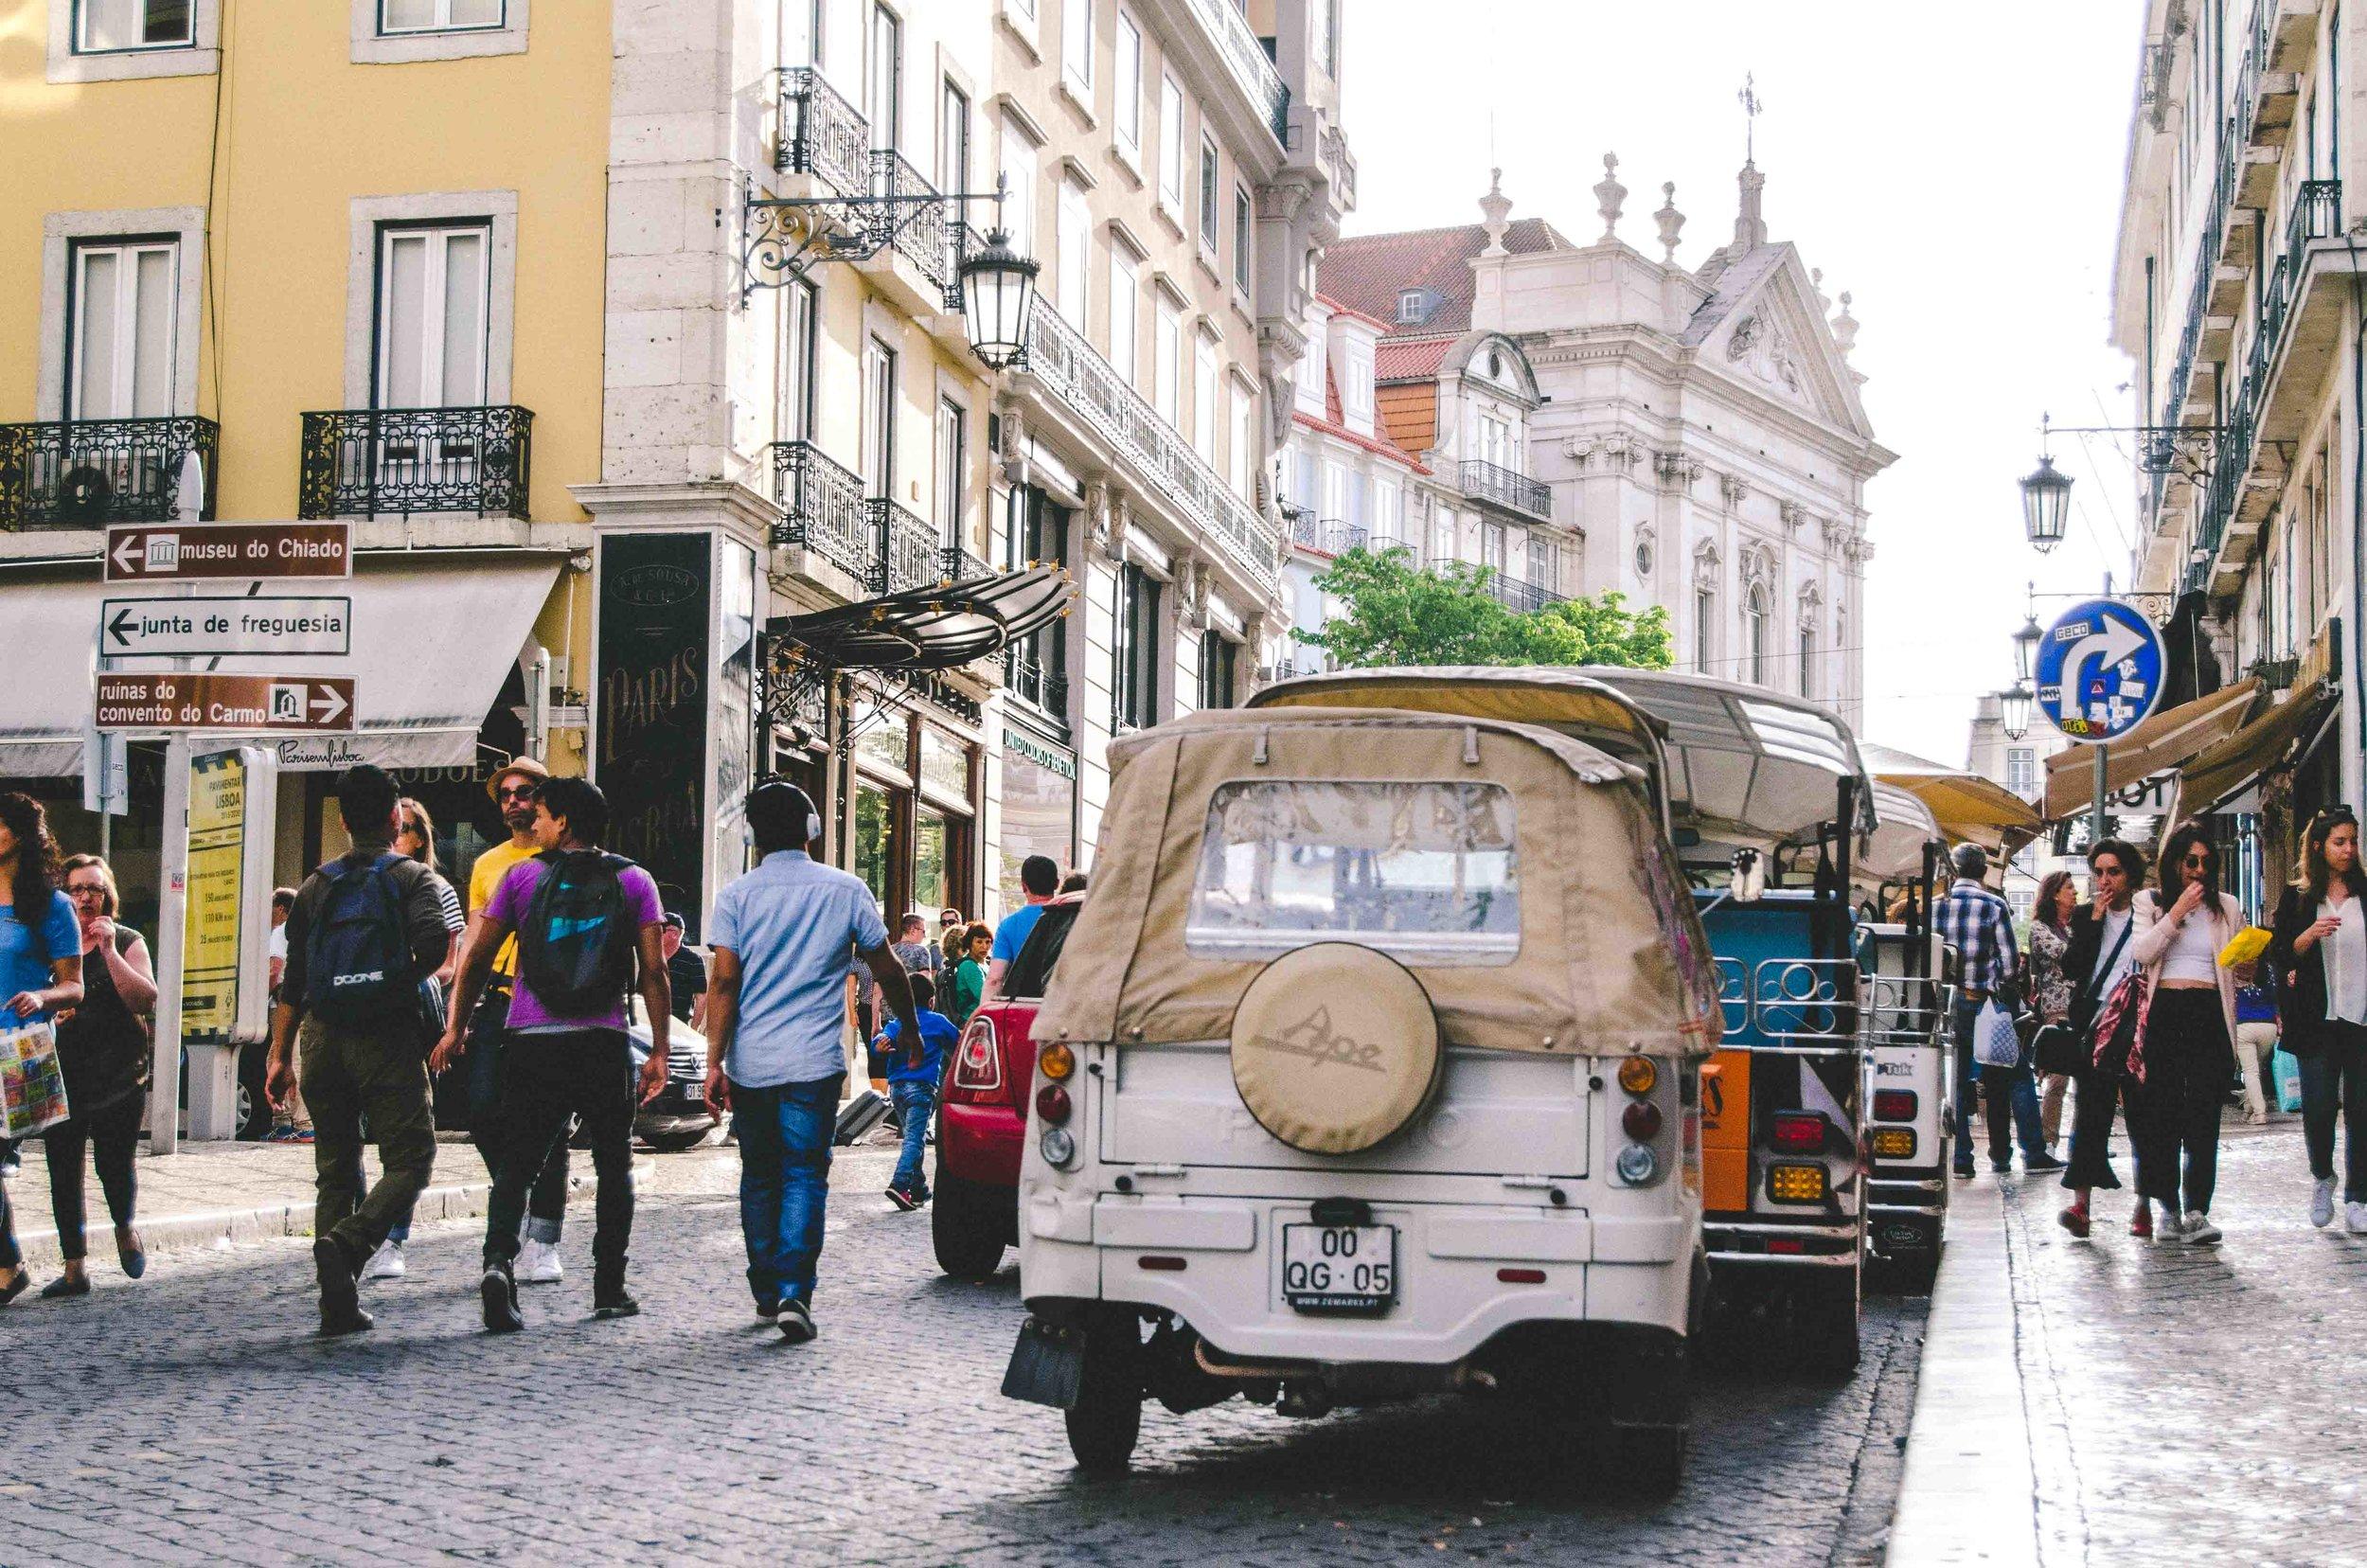 Walking the streets of Lisbon, near Praça Luís de Camões on R. Garrett